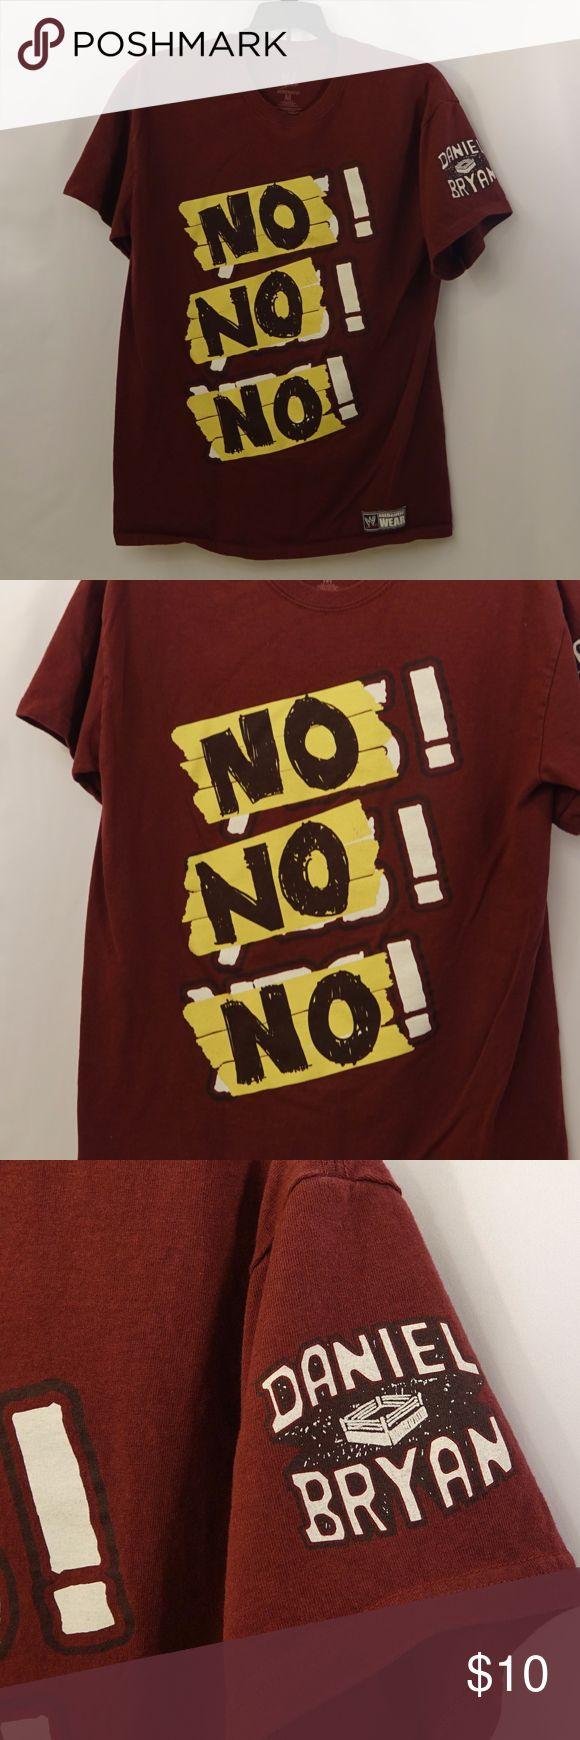 Medium WWE Daniel Bryan No! Burgundy Shirt Pre-owned - missing tag  WWE Daniel Bryan NO! NO! NO!   Medium WWE Shirts Tees - Short Sleeve